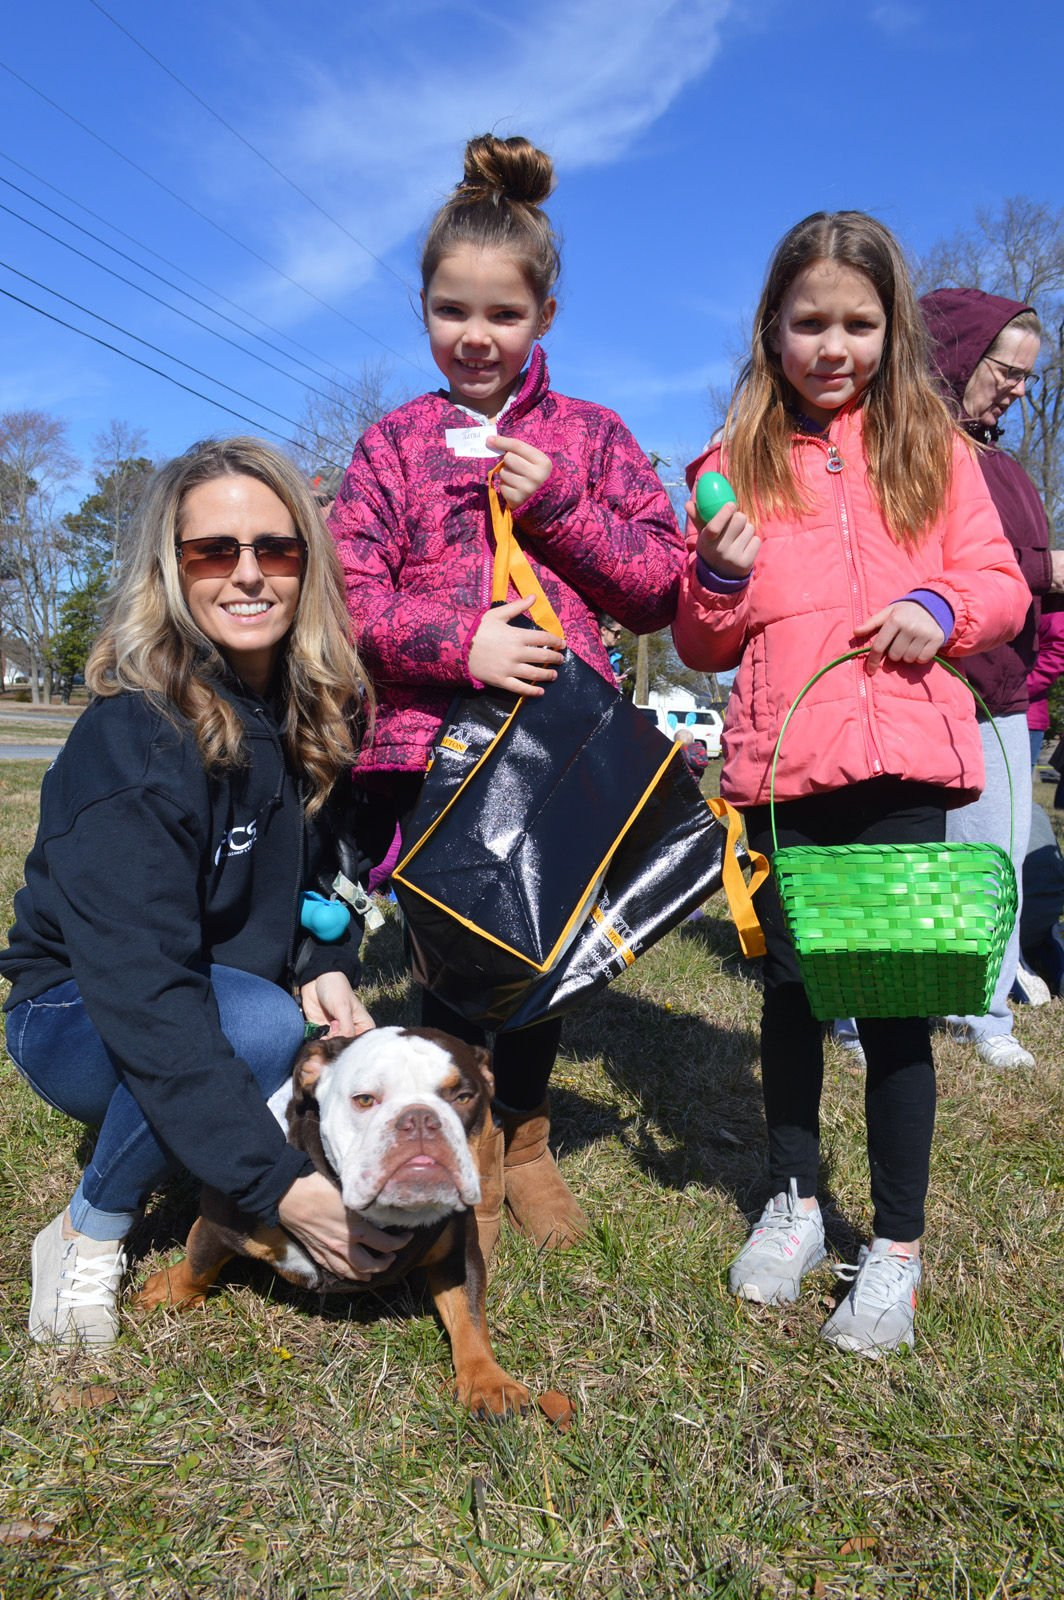 Dagsboro egg hunt - From left, Katy, Emmalee and Erika Ernest, with their English bulldog, Romeo-LW.jpg